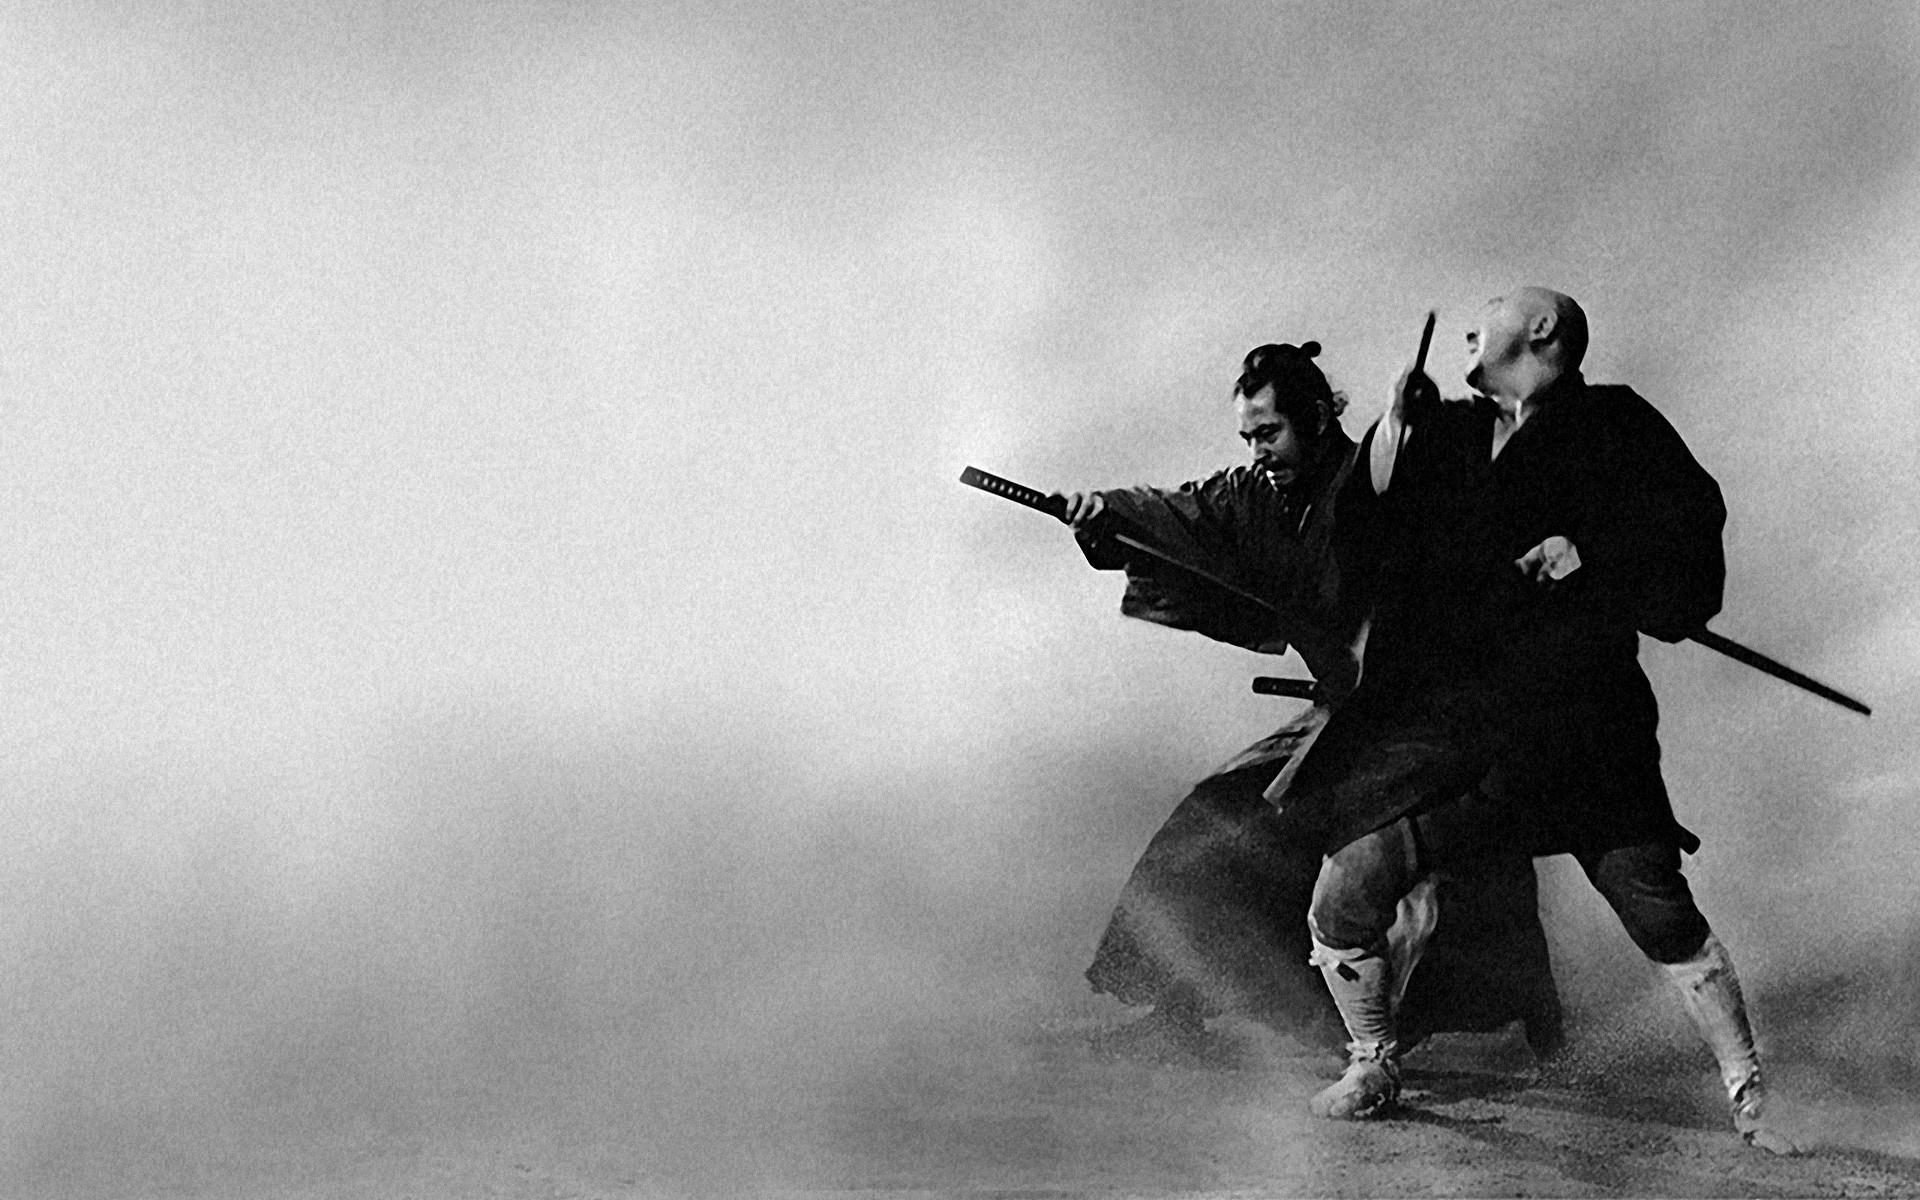 samurai wallpaper   Martial Arts (Aikido, Muay Thai, Karate, BJJ, etc.)    Pinterest   Samurai, Toshiro mifune and Martial